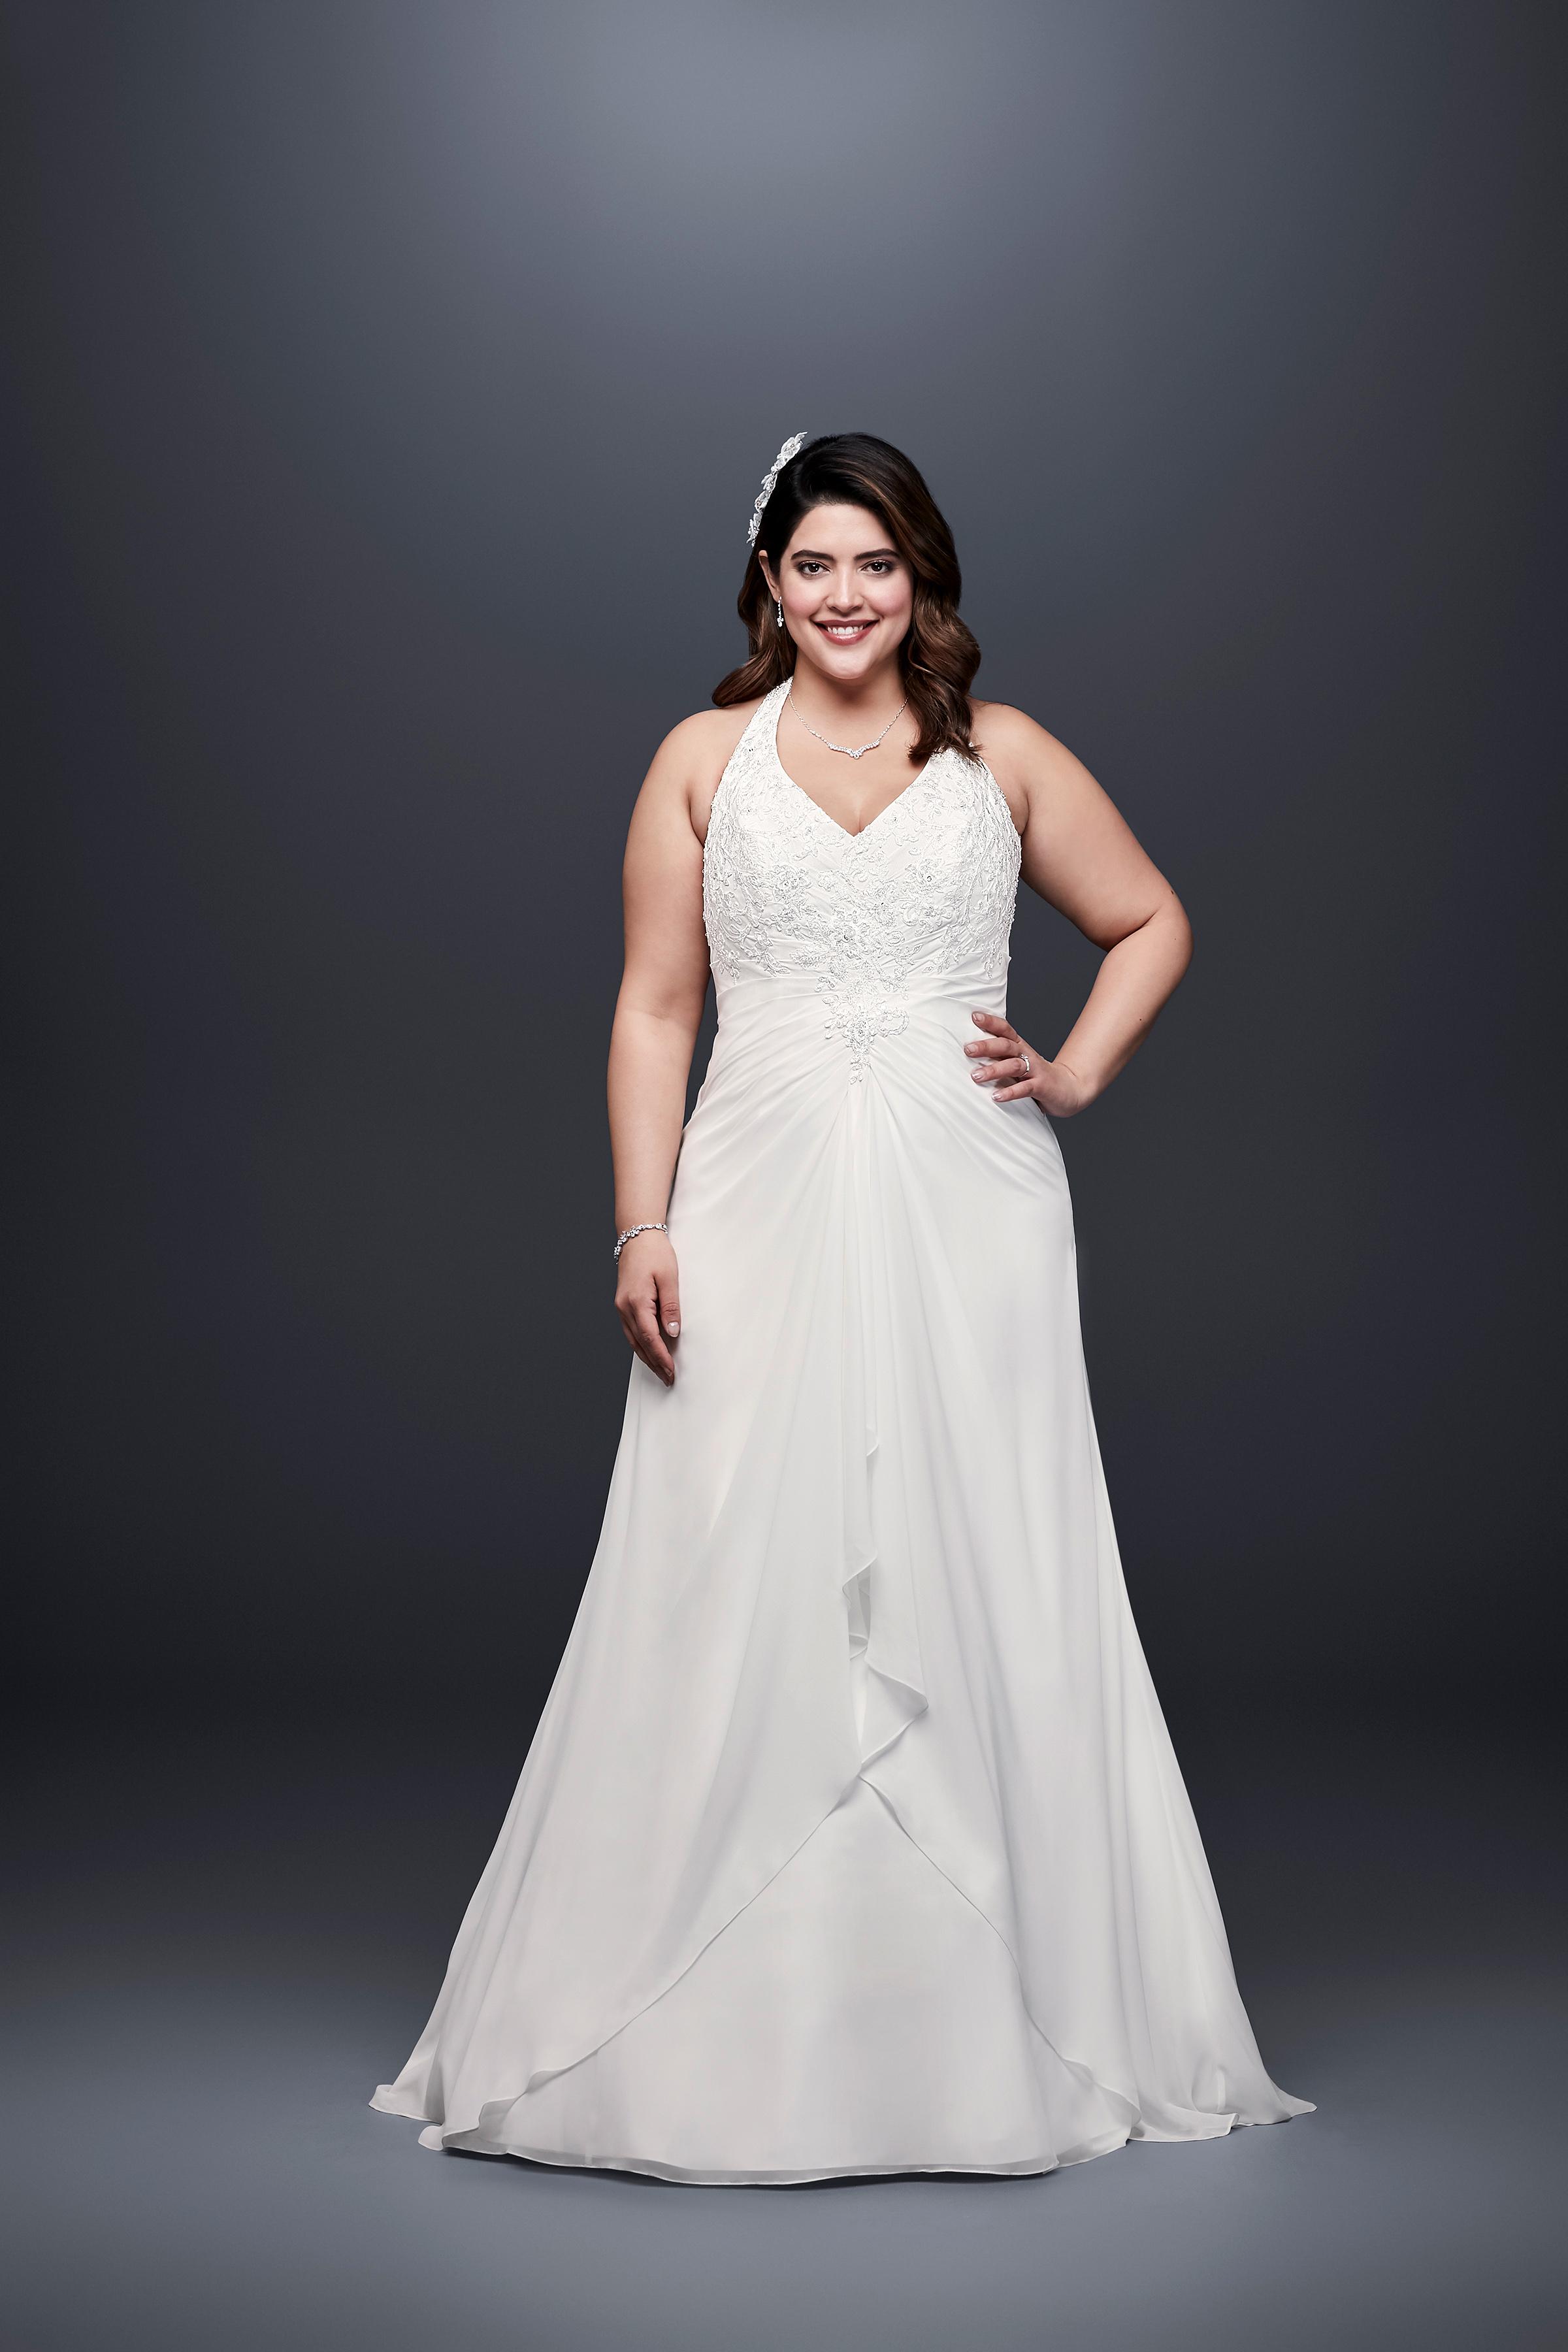 david bridal wedding dress spring 2019 halter a-line